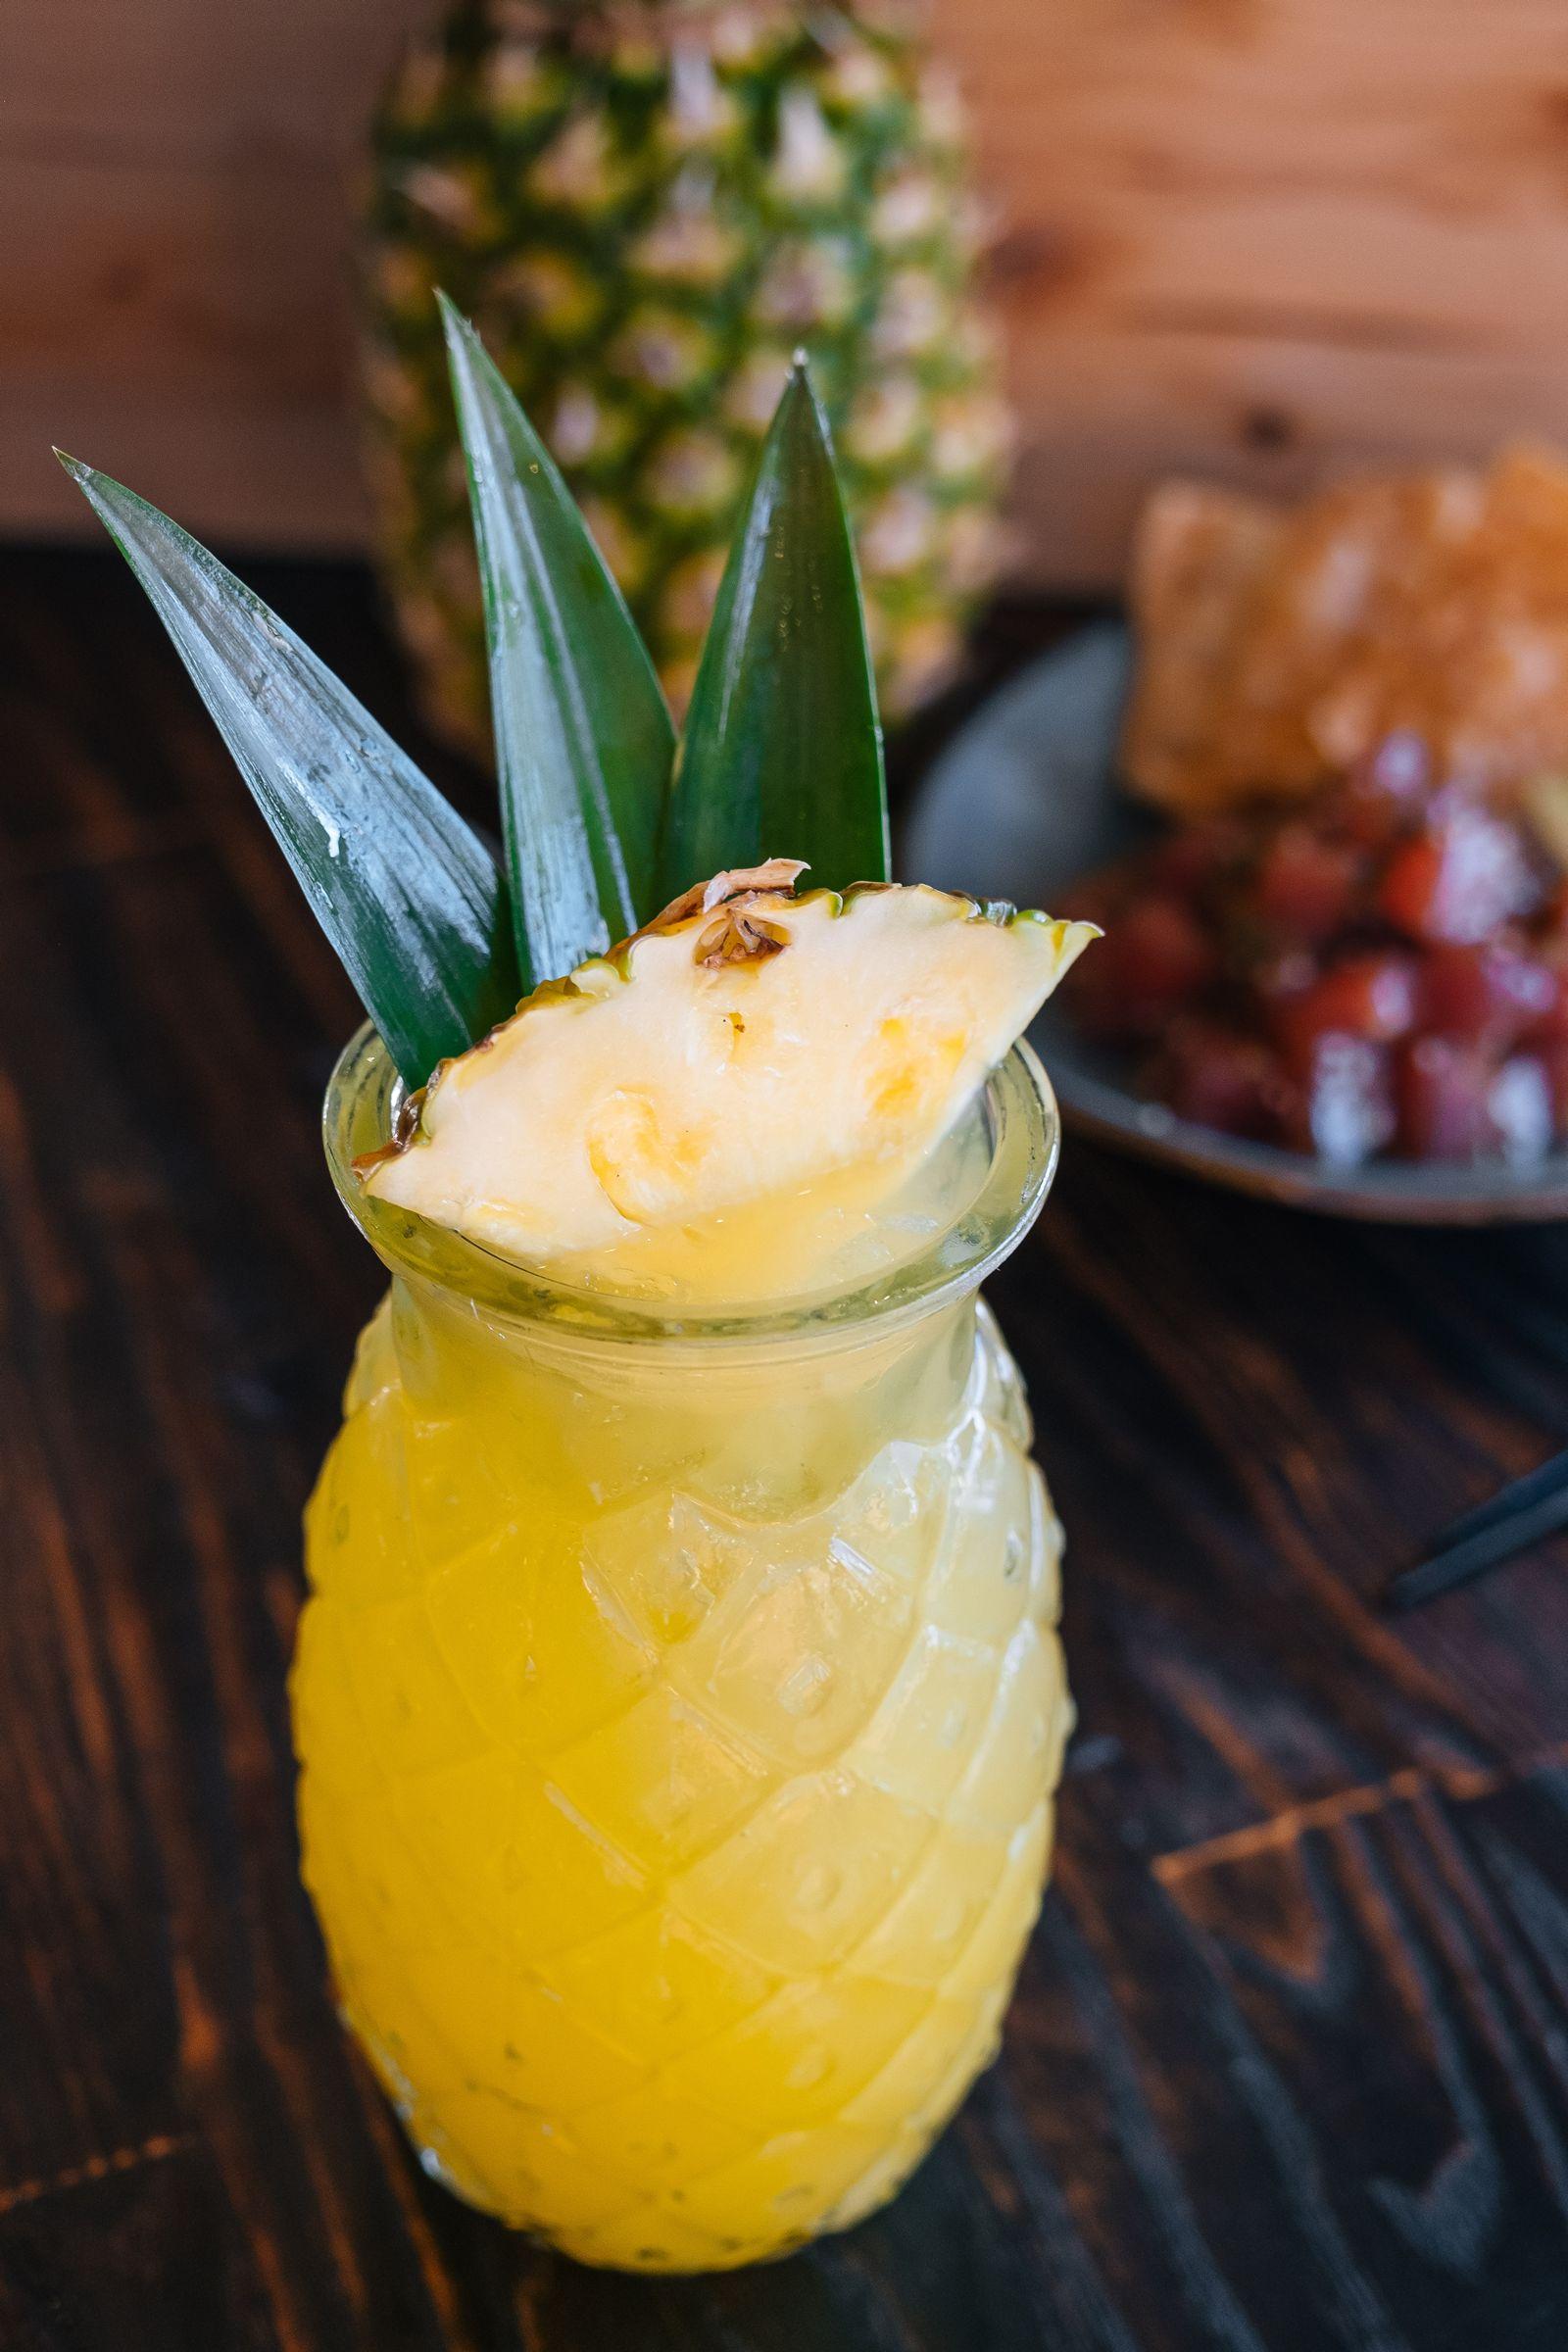 The Lemonshark Poké & Makai Experience Lands in Ohio